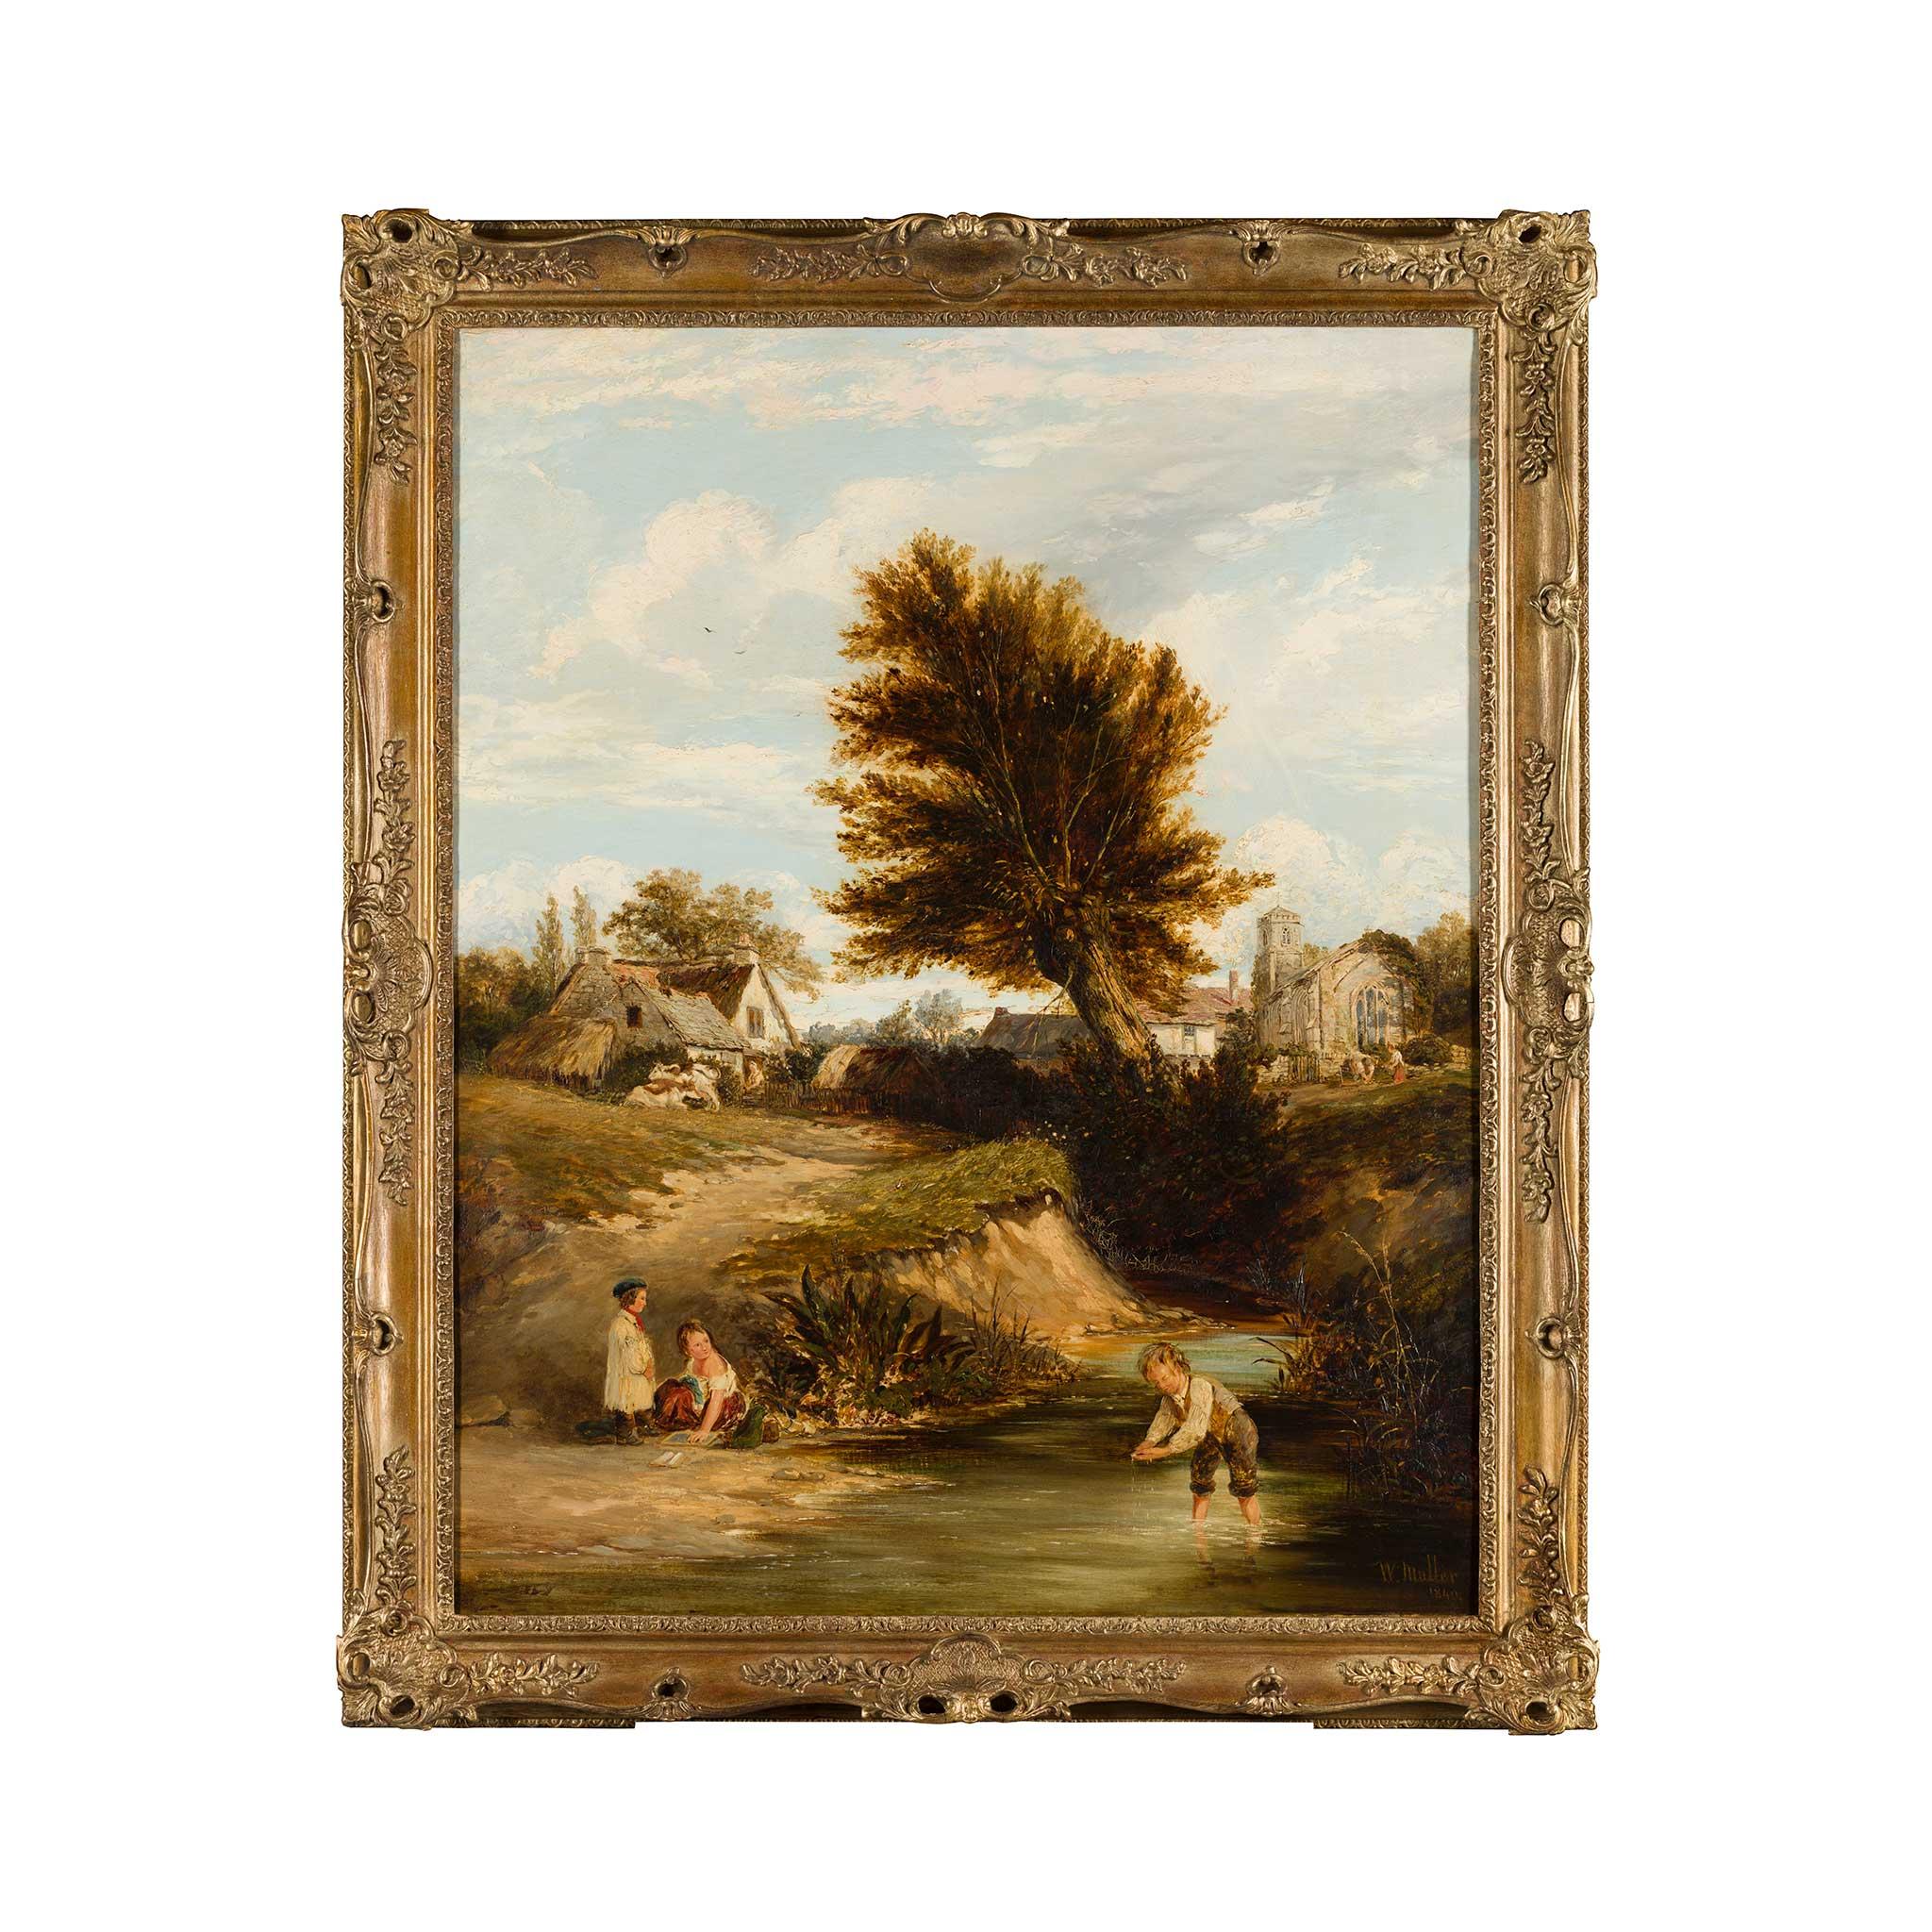 WILLIAM JAMES MULLER (BRITISH 1812-1845) GUDDLING FOR TROUT - Image 2 of 3